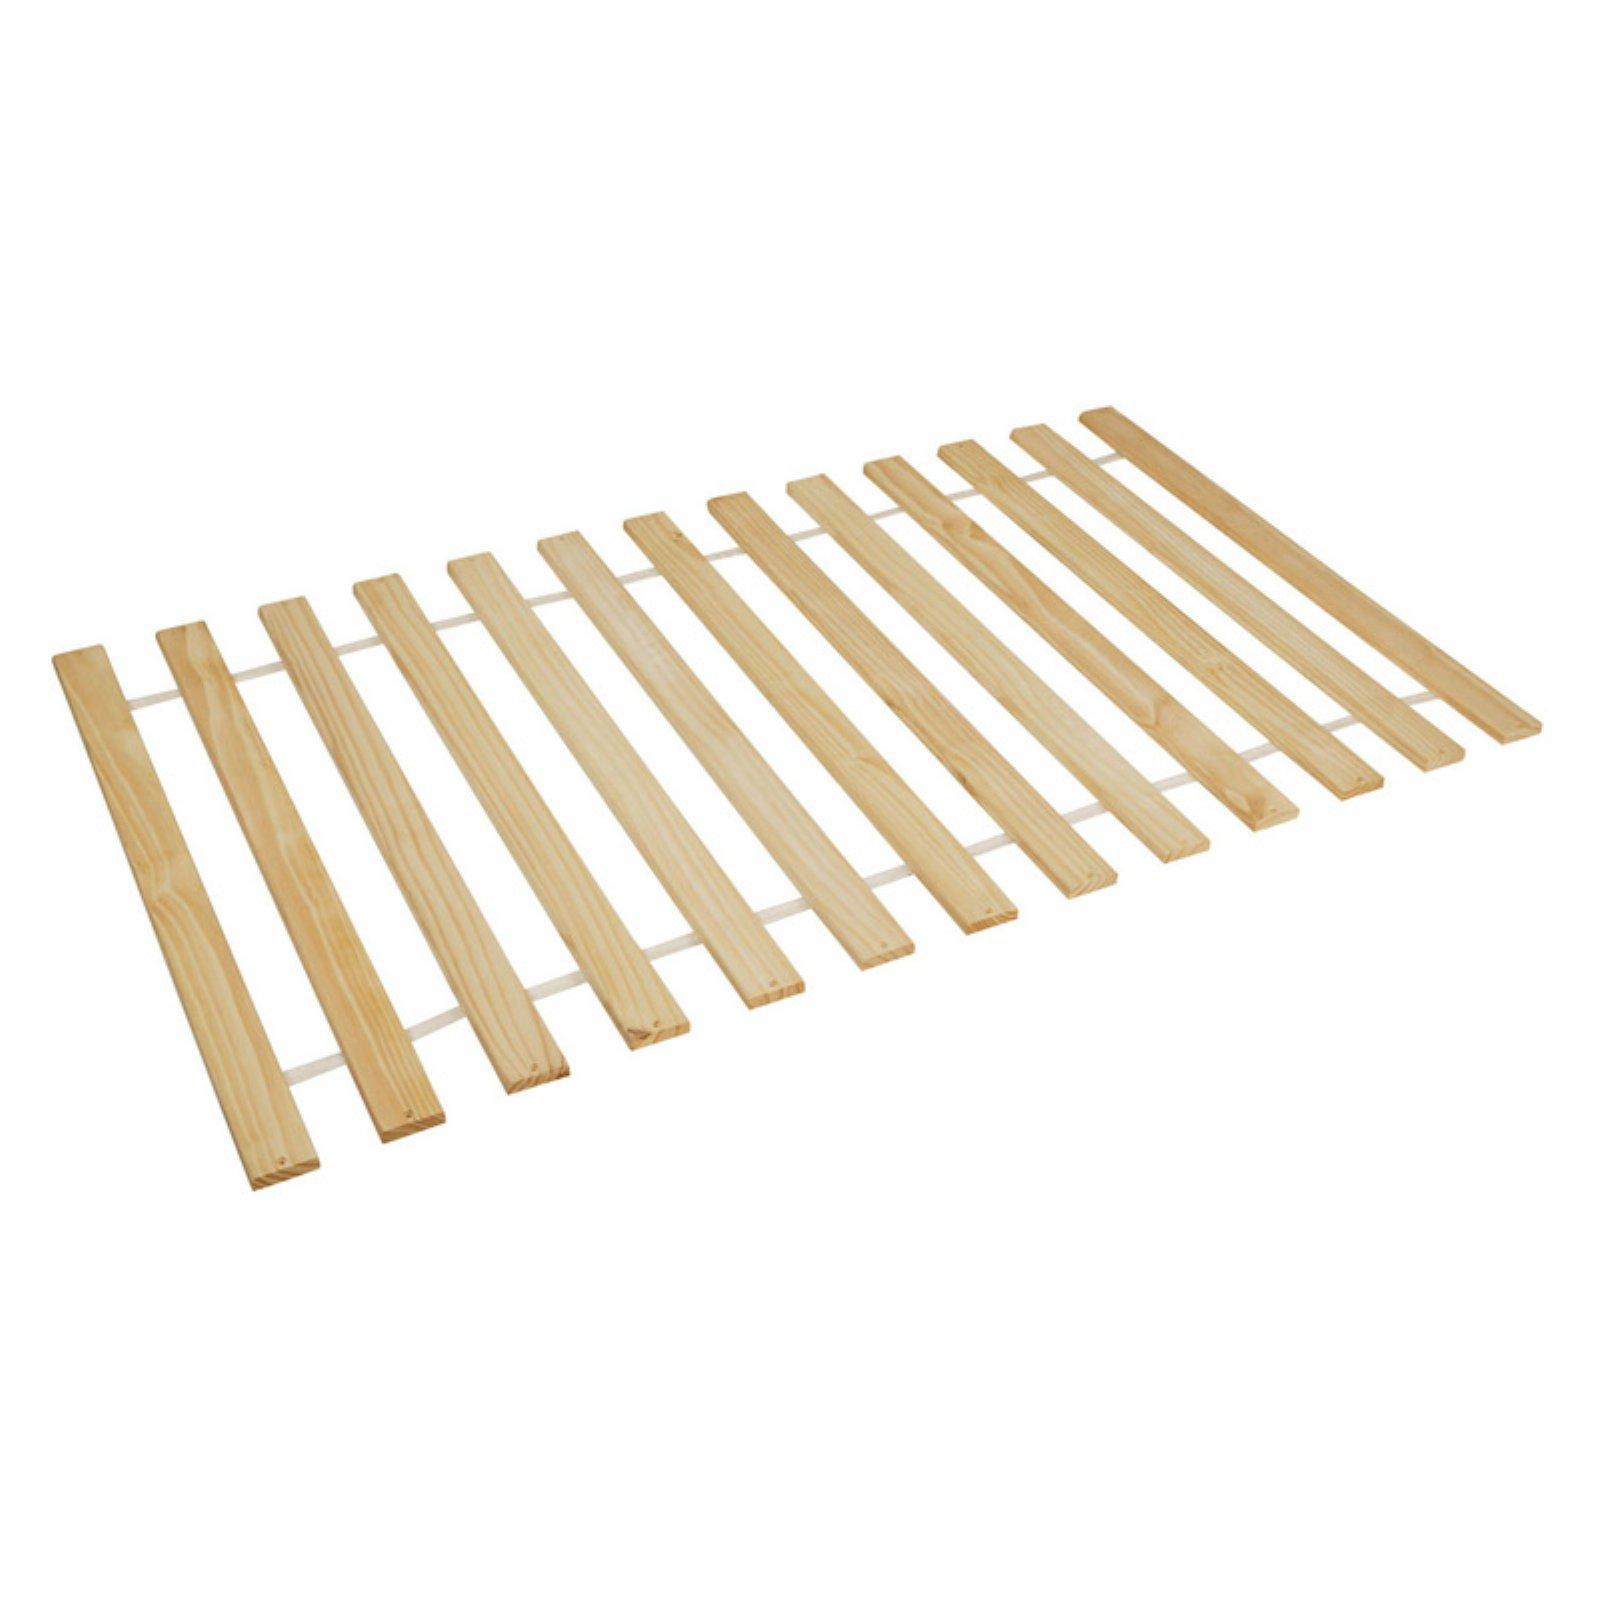 Acme Furniture Natural Wood Bunkie Board Walmart Com